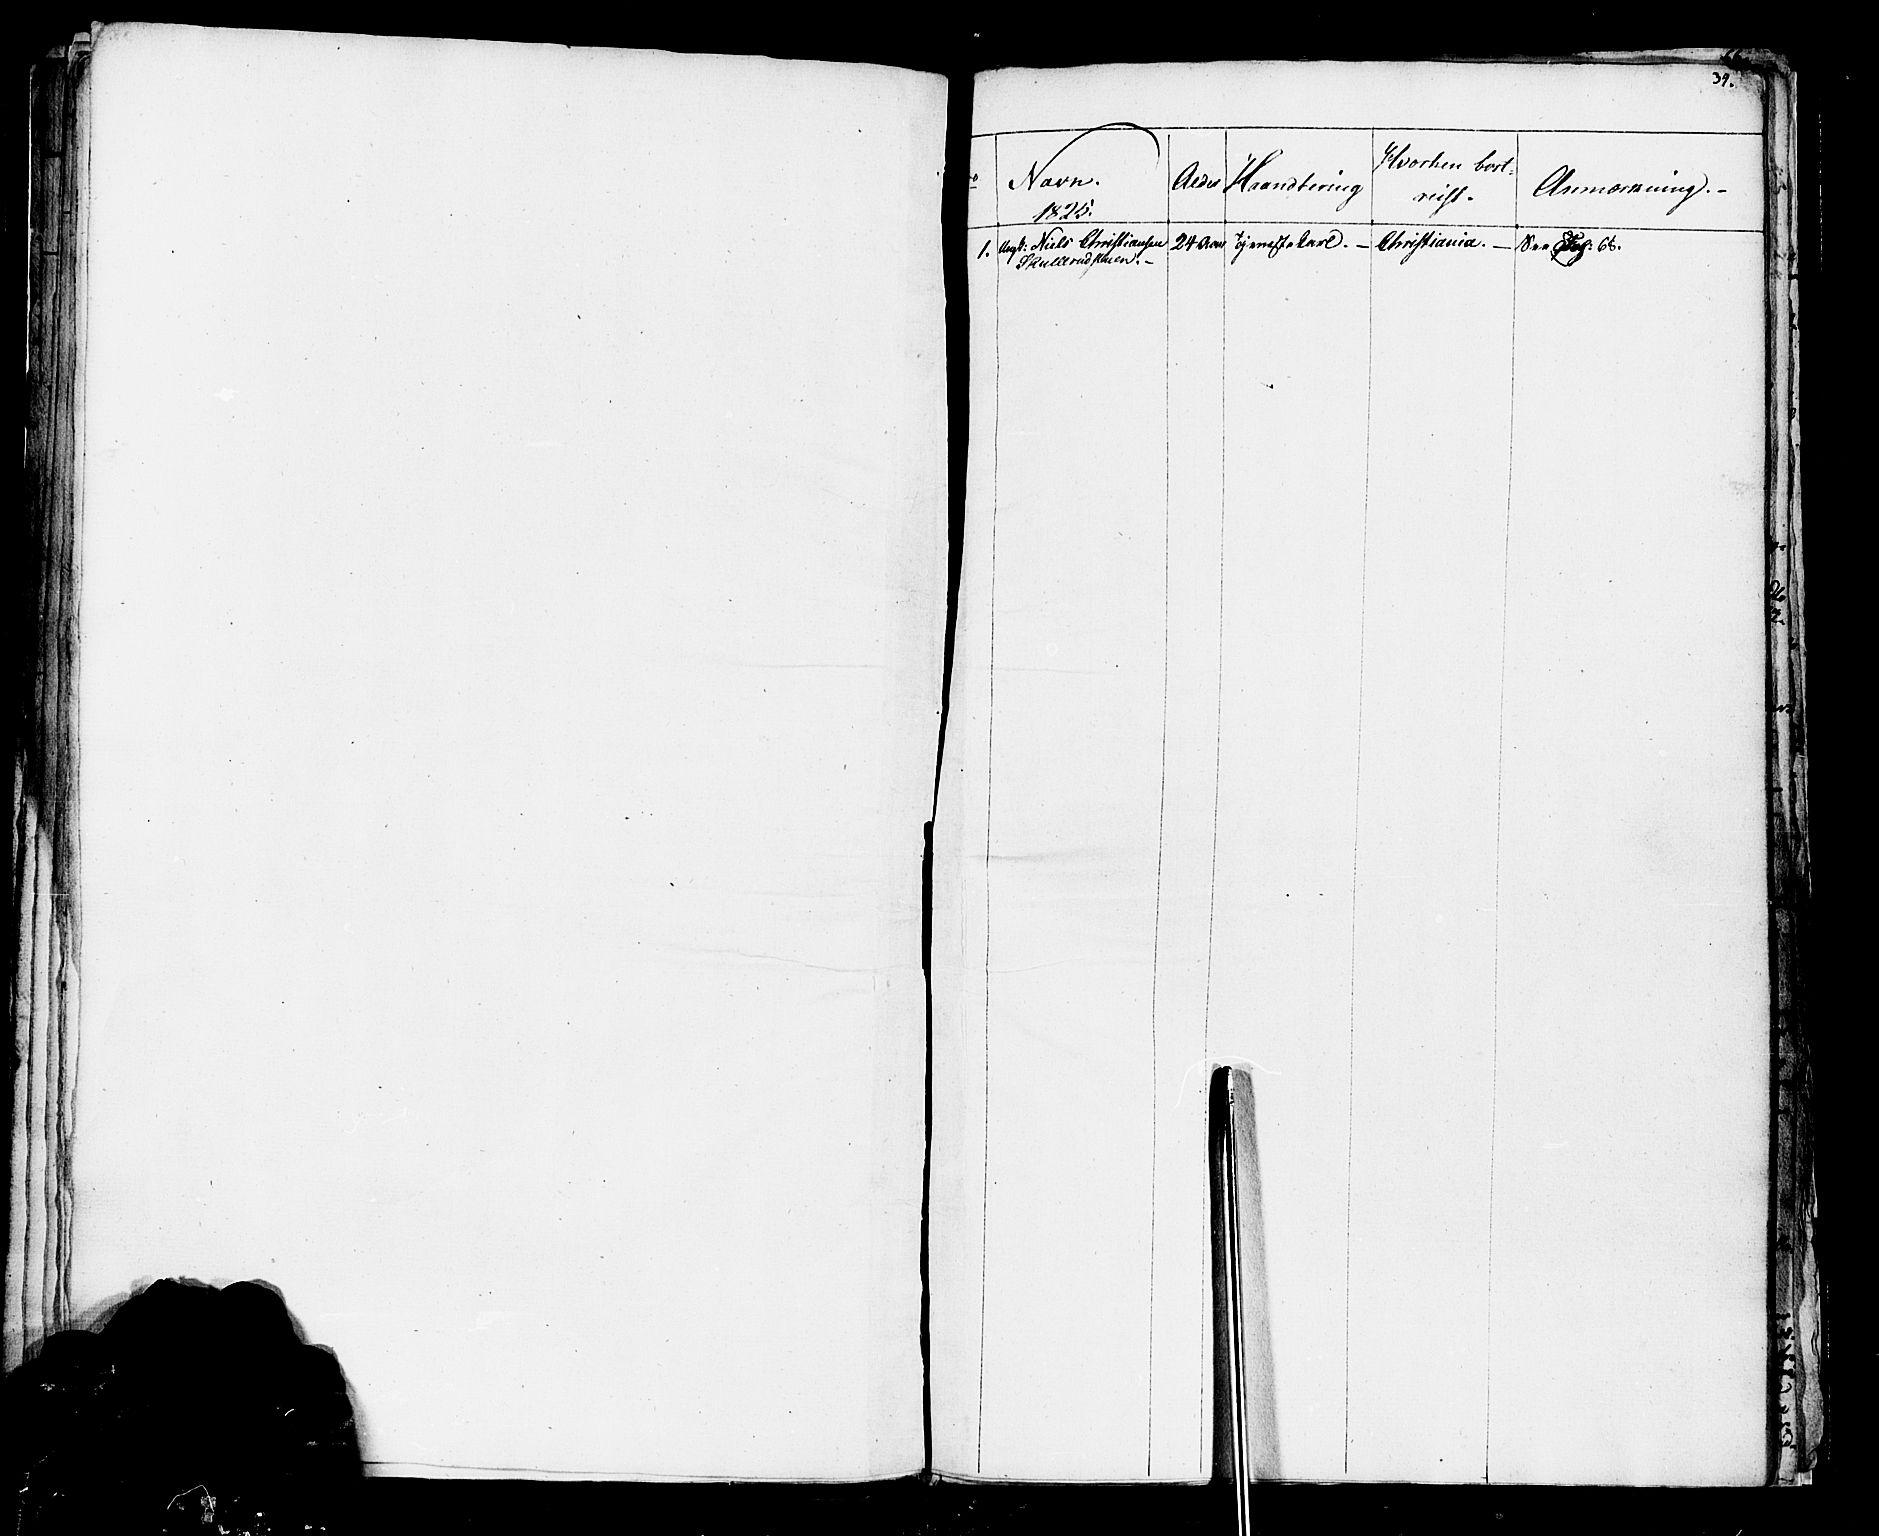 SAH, Vestre Toten prestekontor, H/Ha/Haa/L0001: Ministerialbok nr. 1, 1825-1826, s. 39